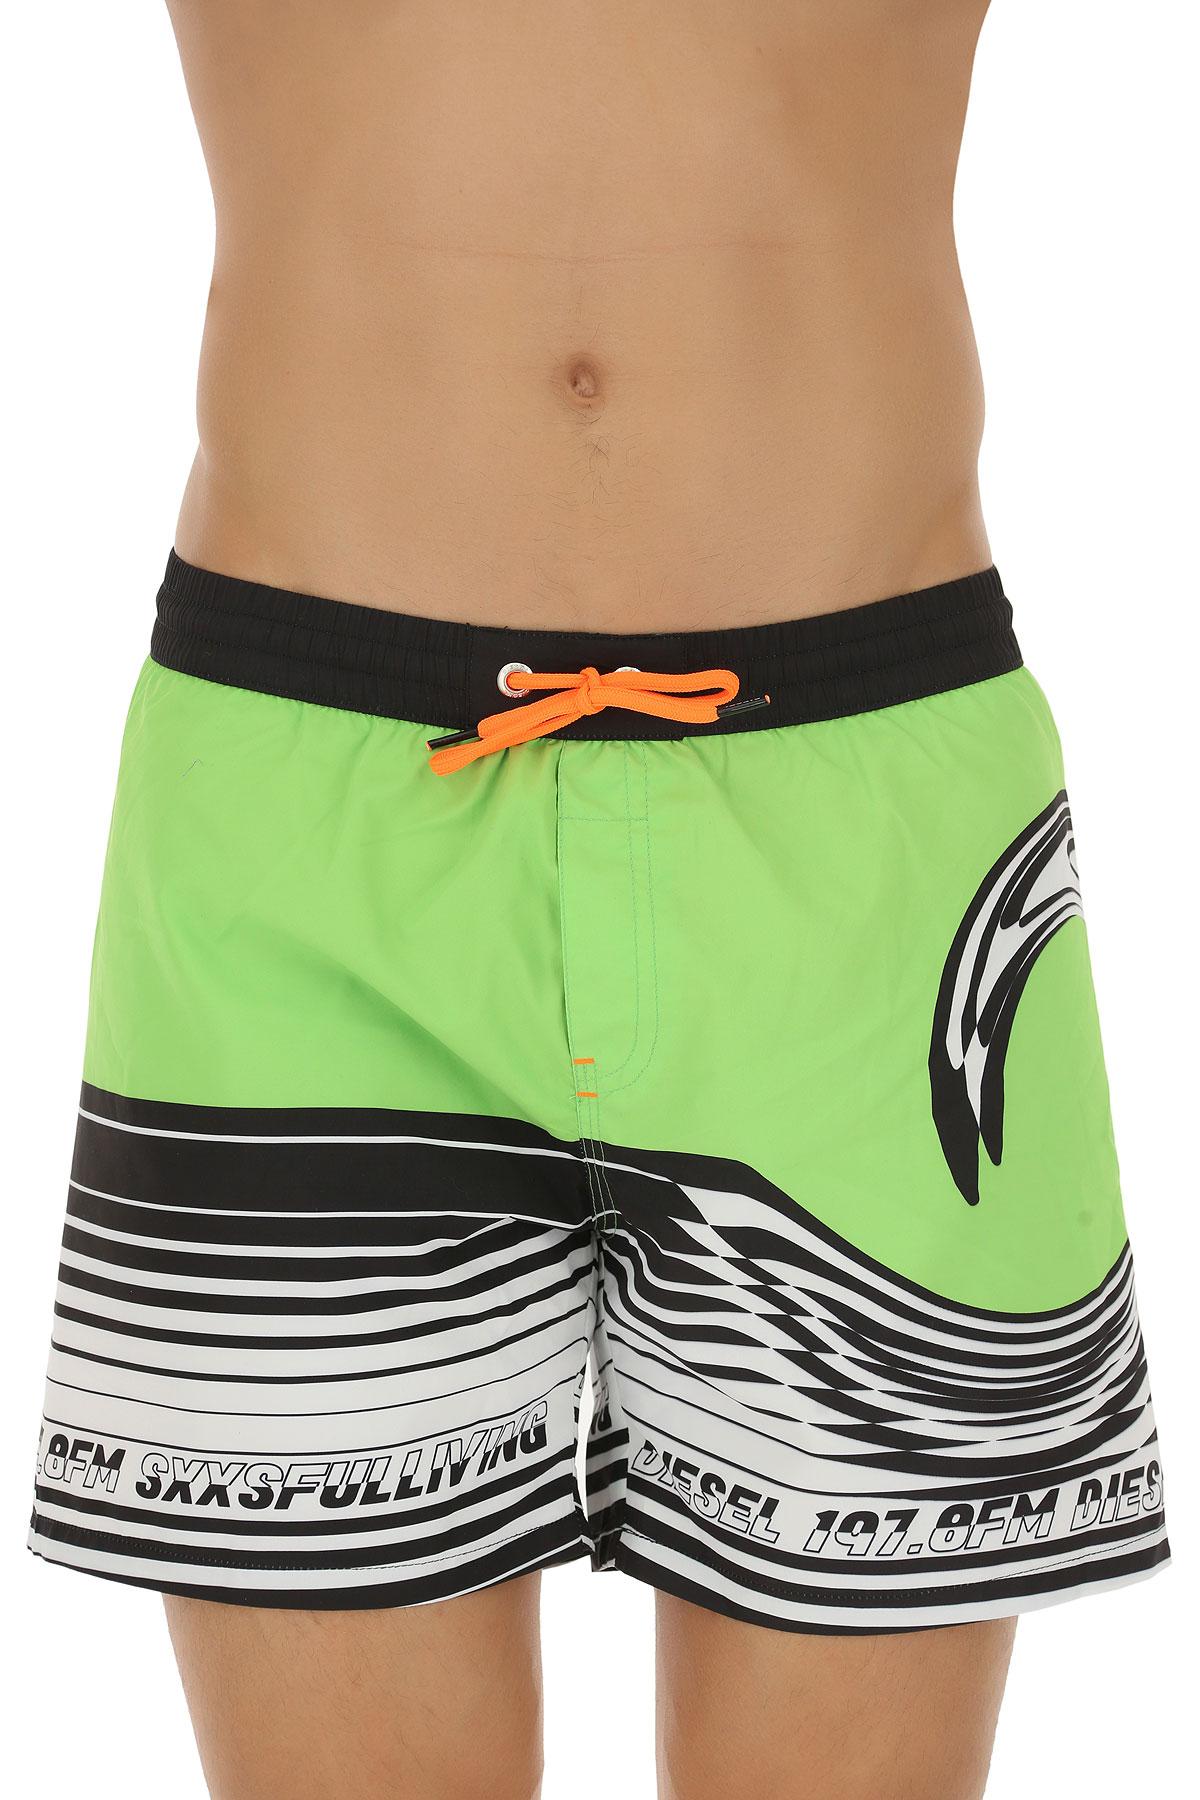 Image of Diesel Swim Shorts Trunks for Men, Absinthe Green, polyester, 2017, S M L XL